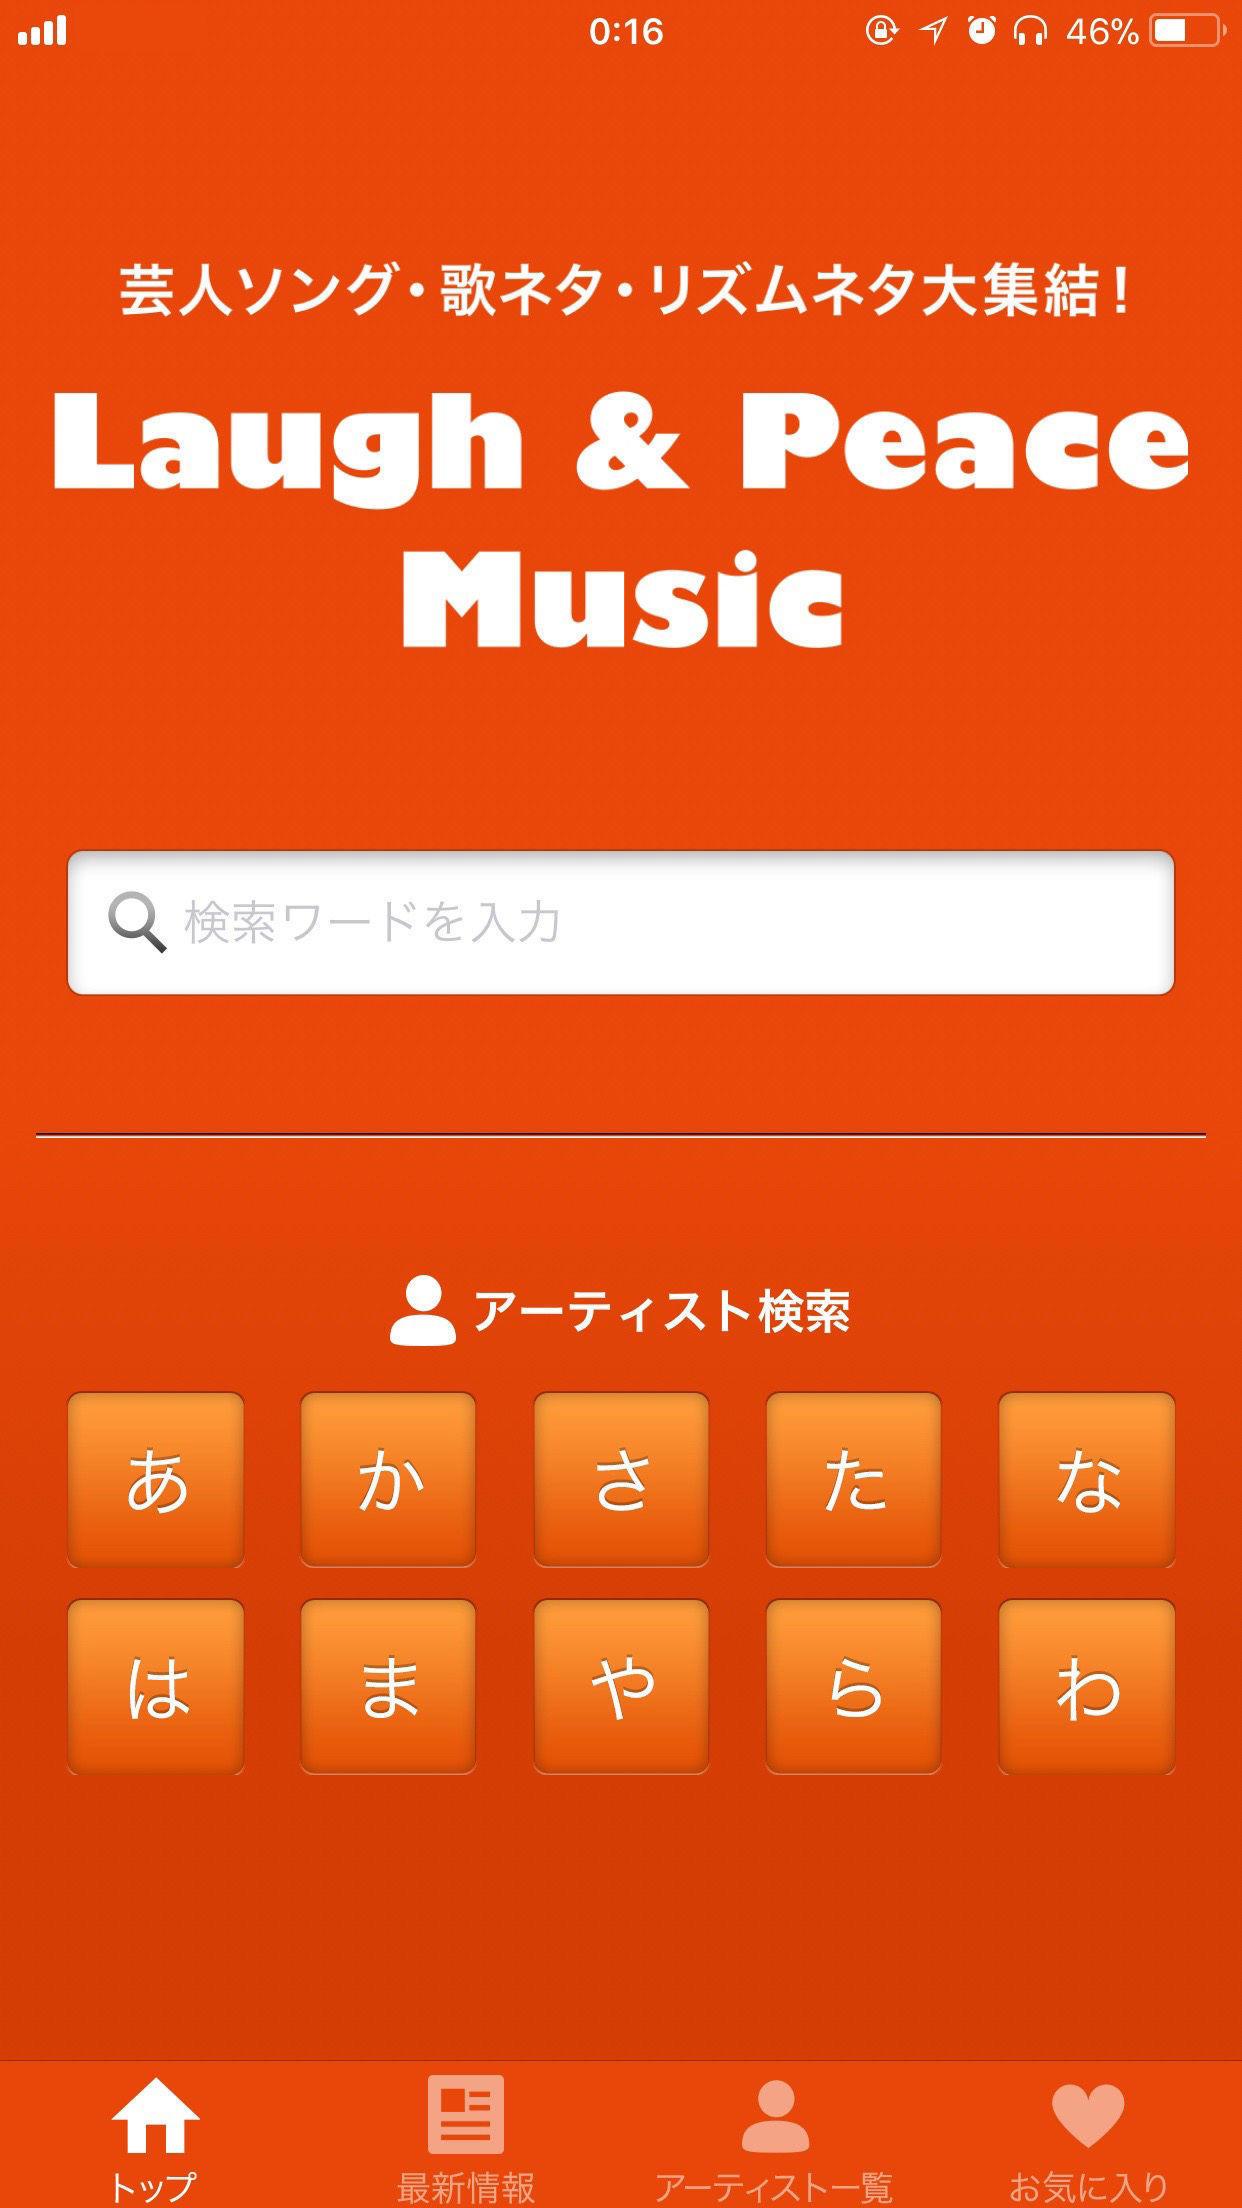 http://news.yoshimoto.co.jp/20180131161320-54576ceb277e702d92161d4de613fafdf903985d.jpg